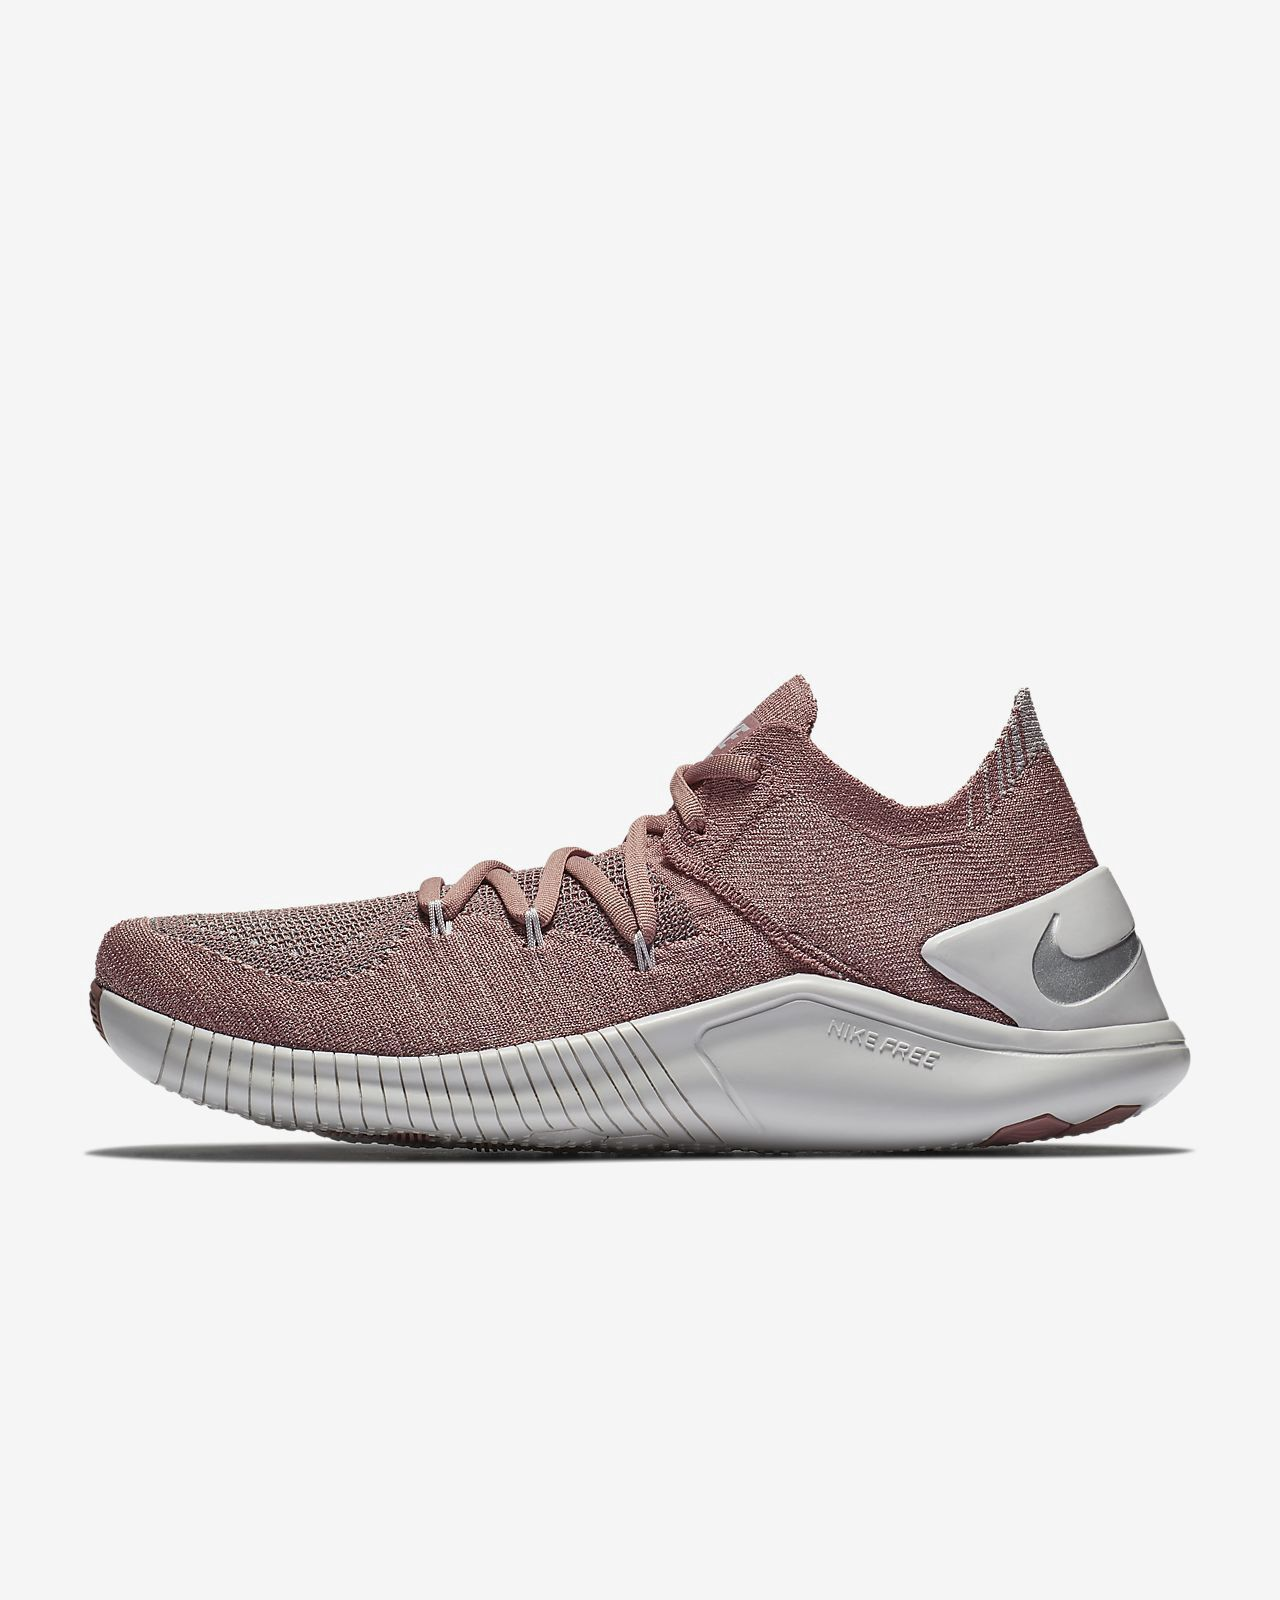 83d0be9097a1 Nike Free Tr Flyknit 3 Lm Women s Training Shoe - 10.5 Silver ...